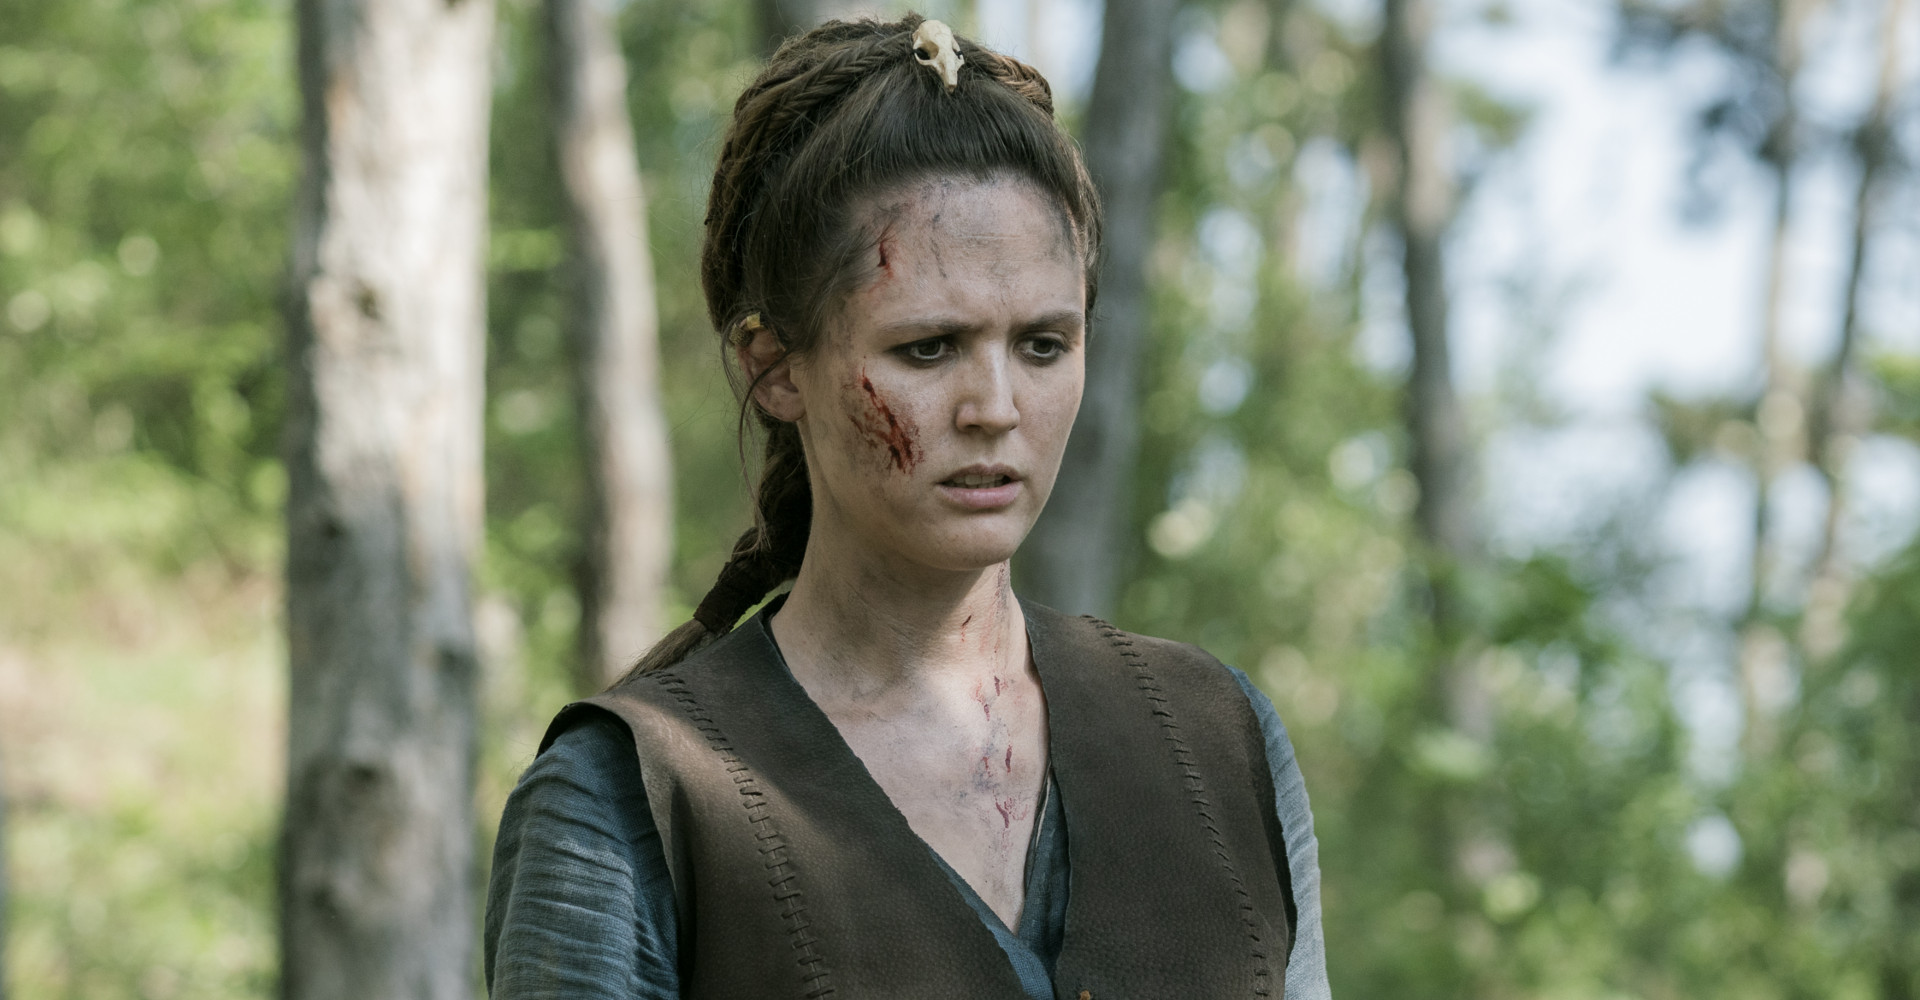 Emily Cox in The Last Kingdom